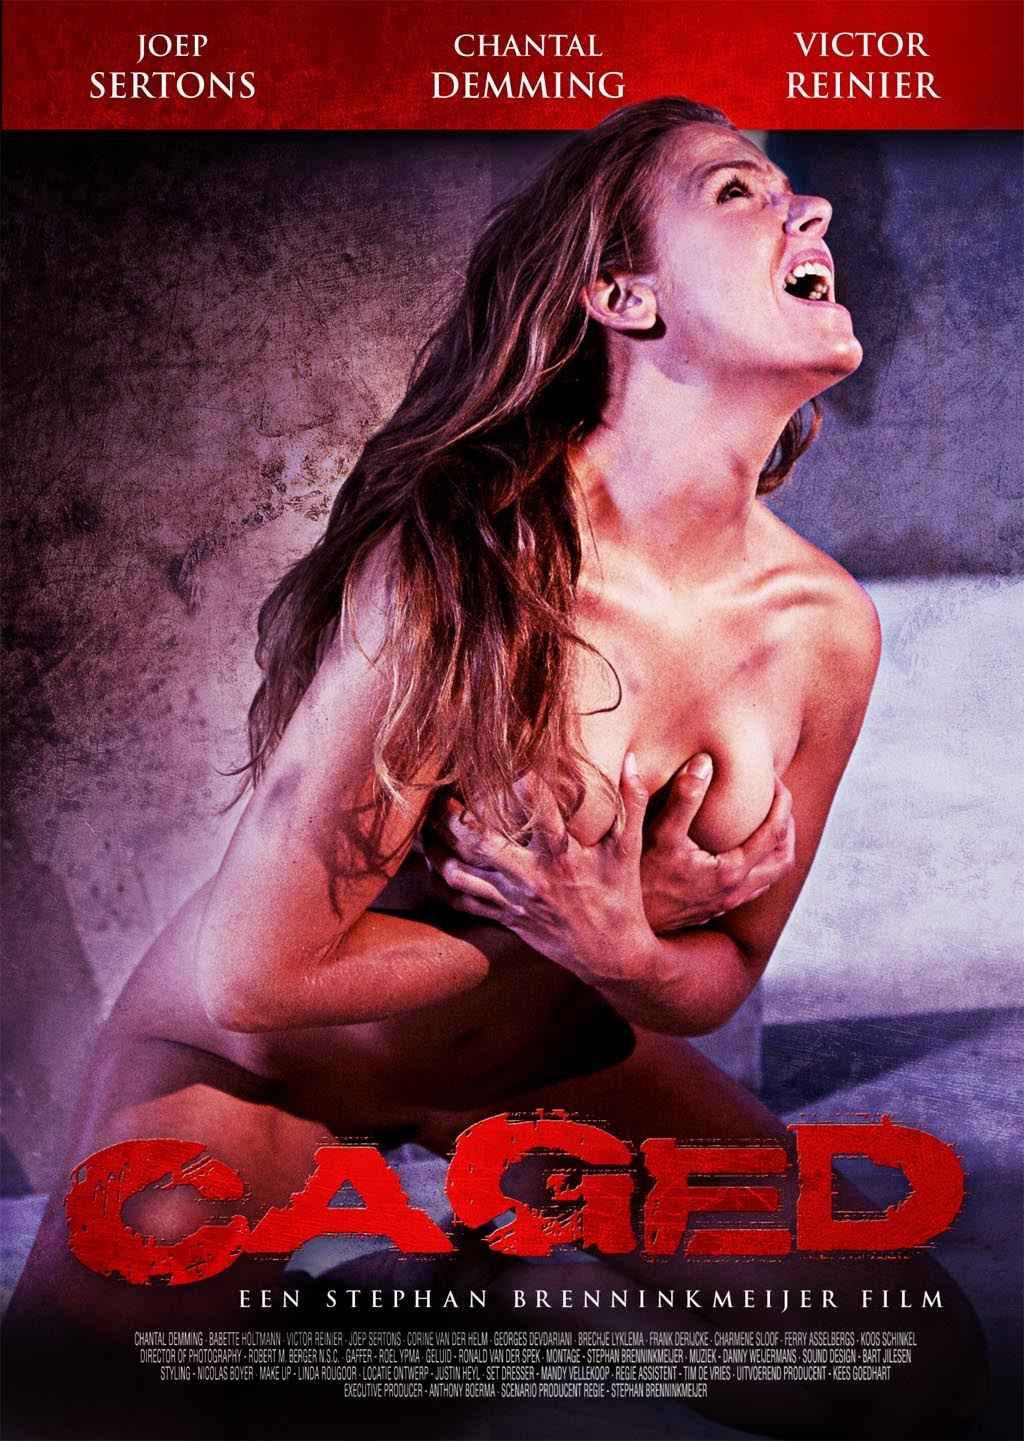 Caged chantal demming 2011 sex scene - 2 part 6